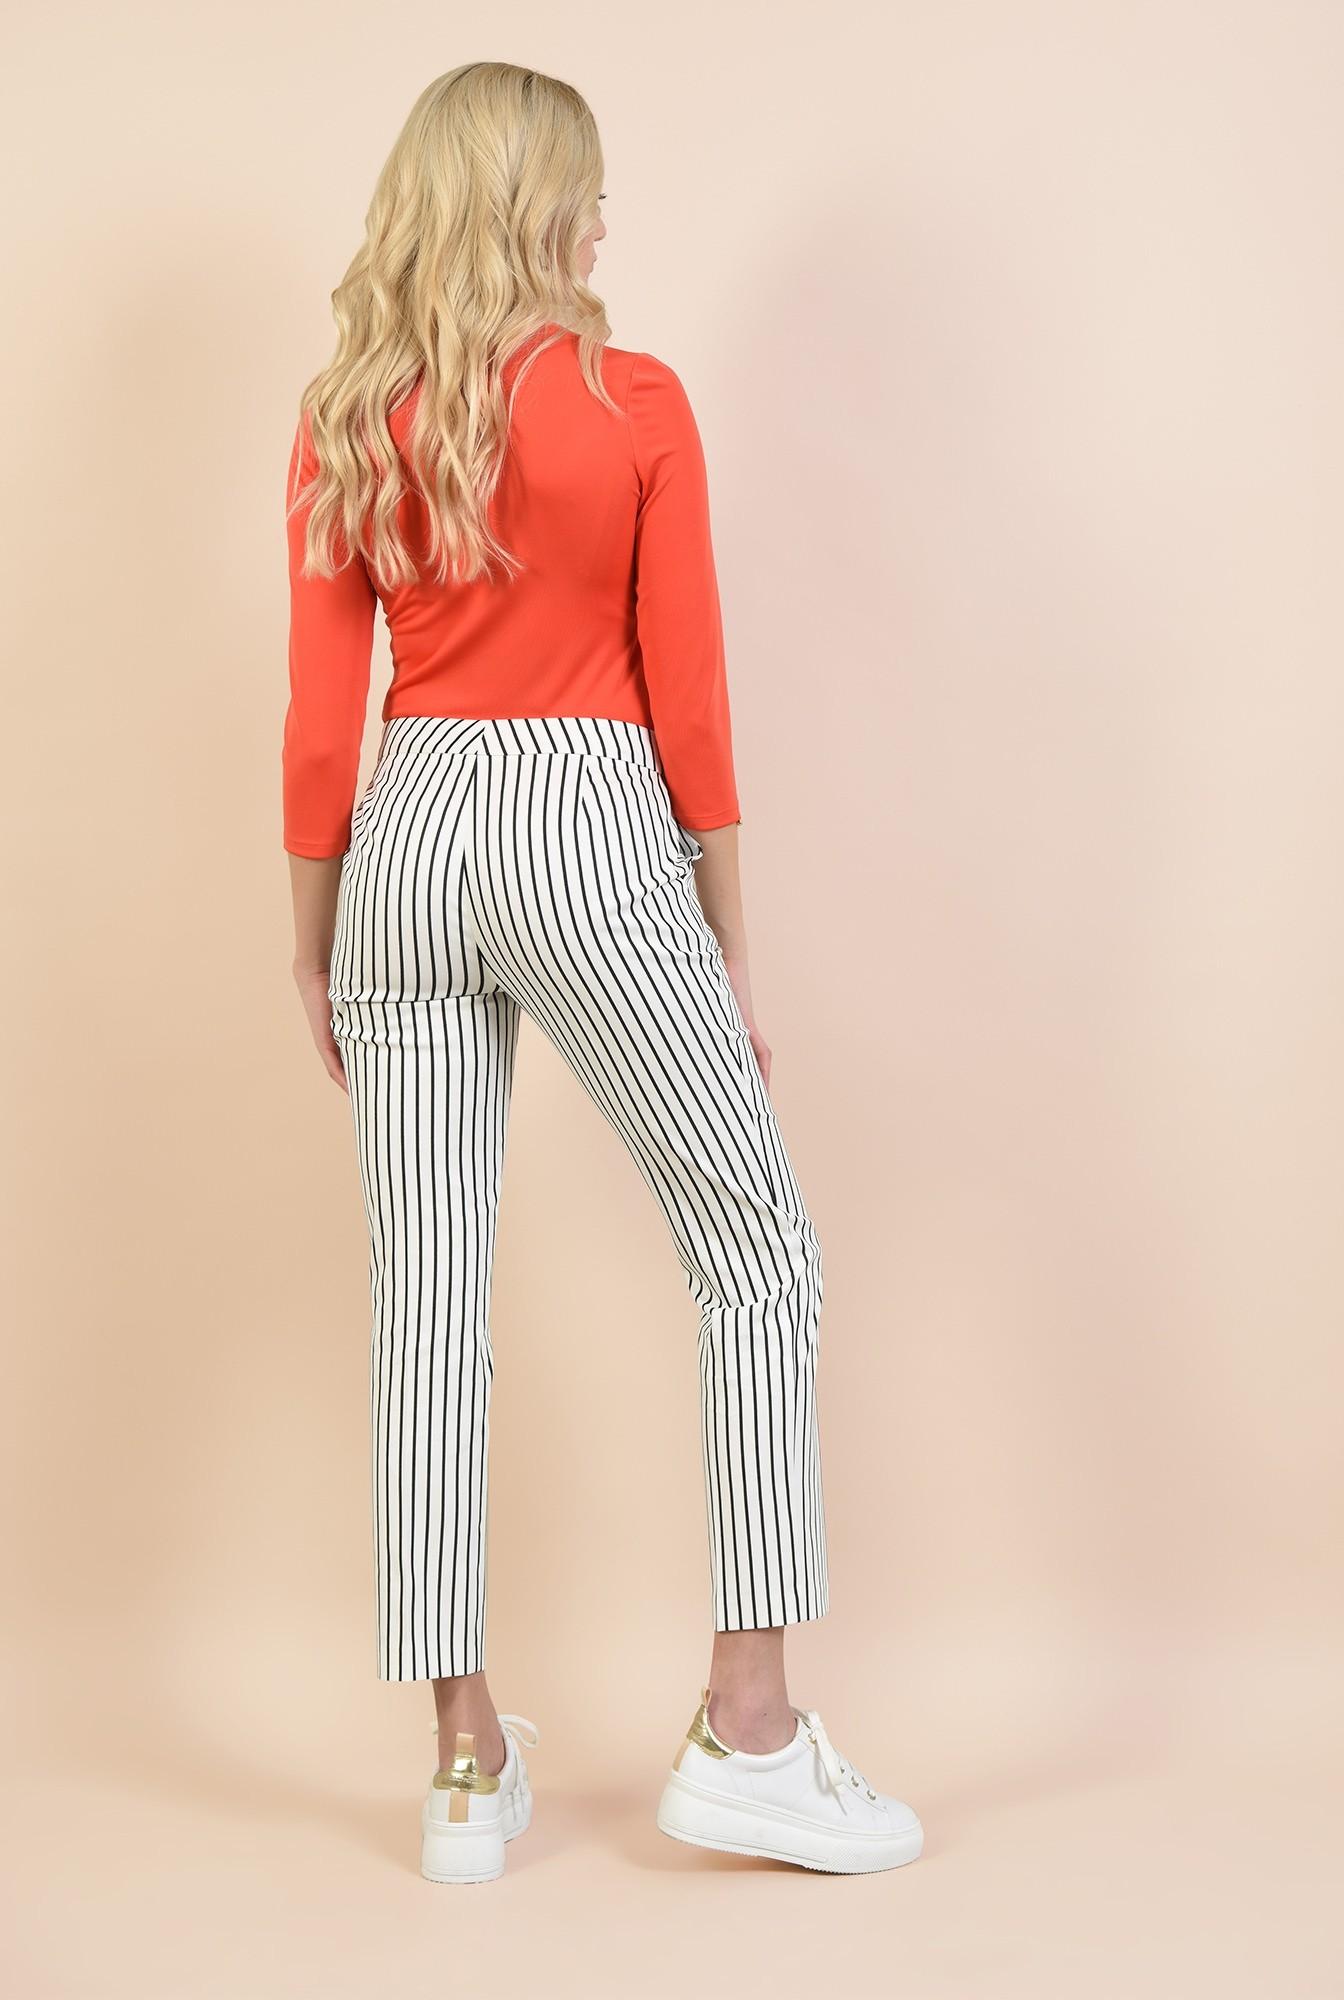 1 - pantaloni casual, cu dungi, conici, buzunare in cusatura